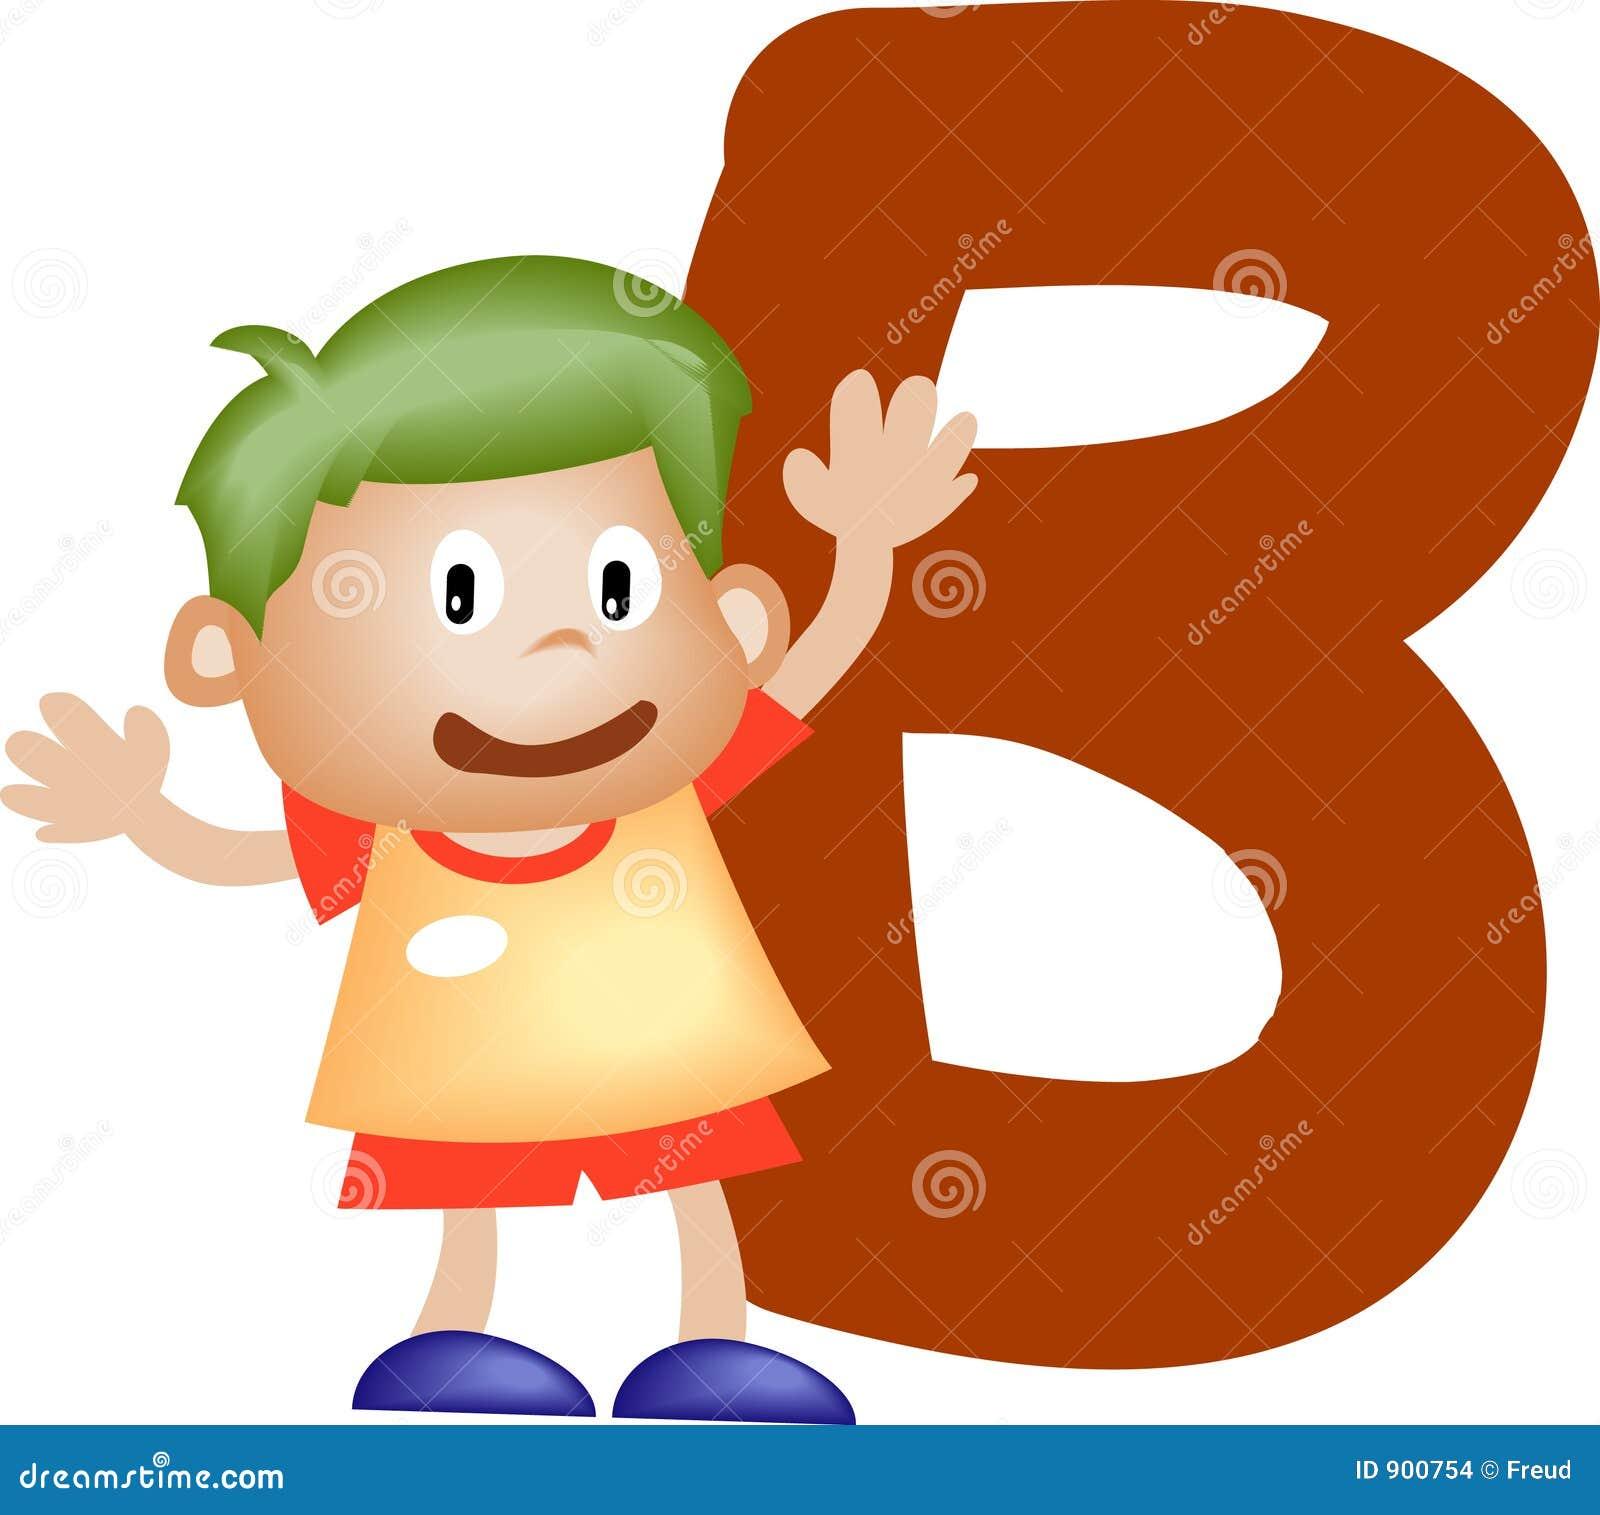 Alphabet letter (boy version), also checkout the girl version.